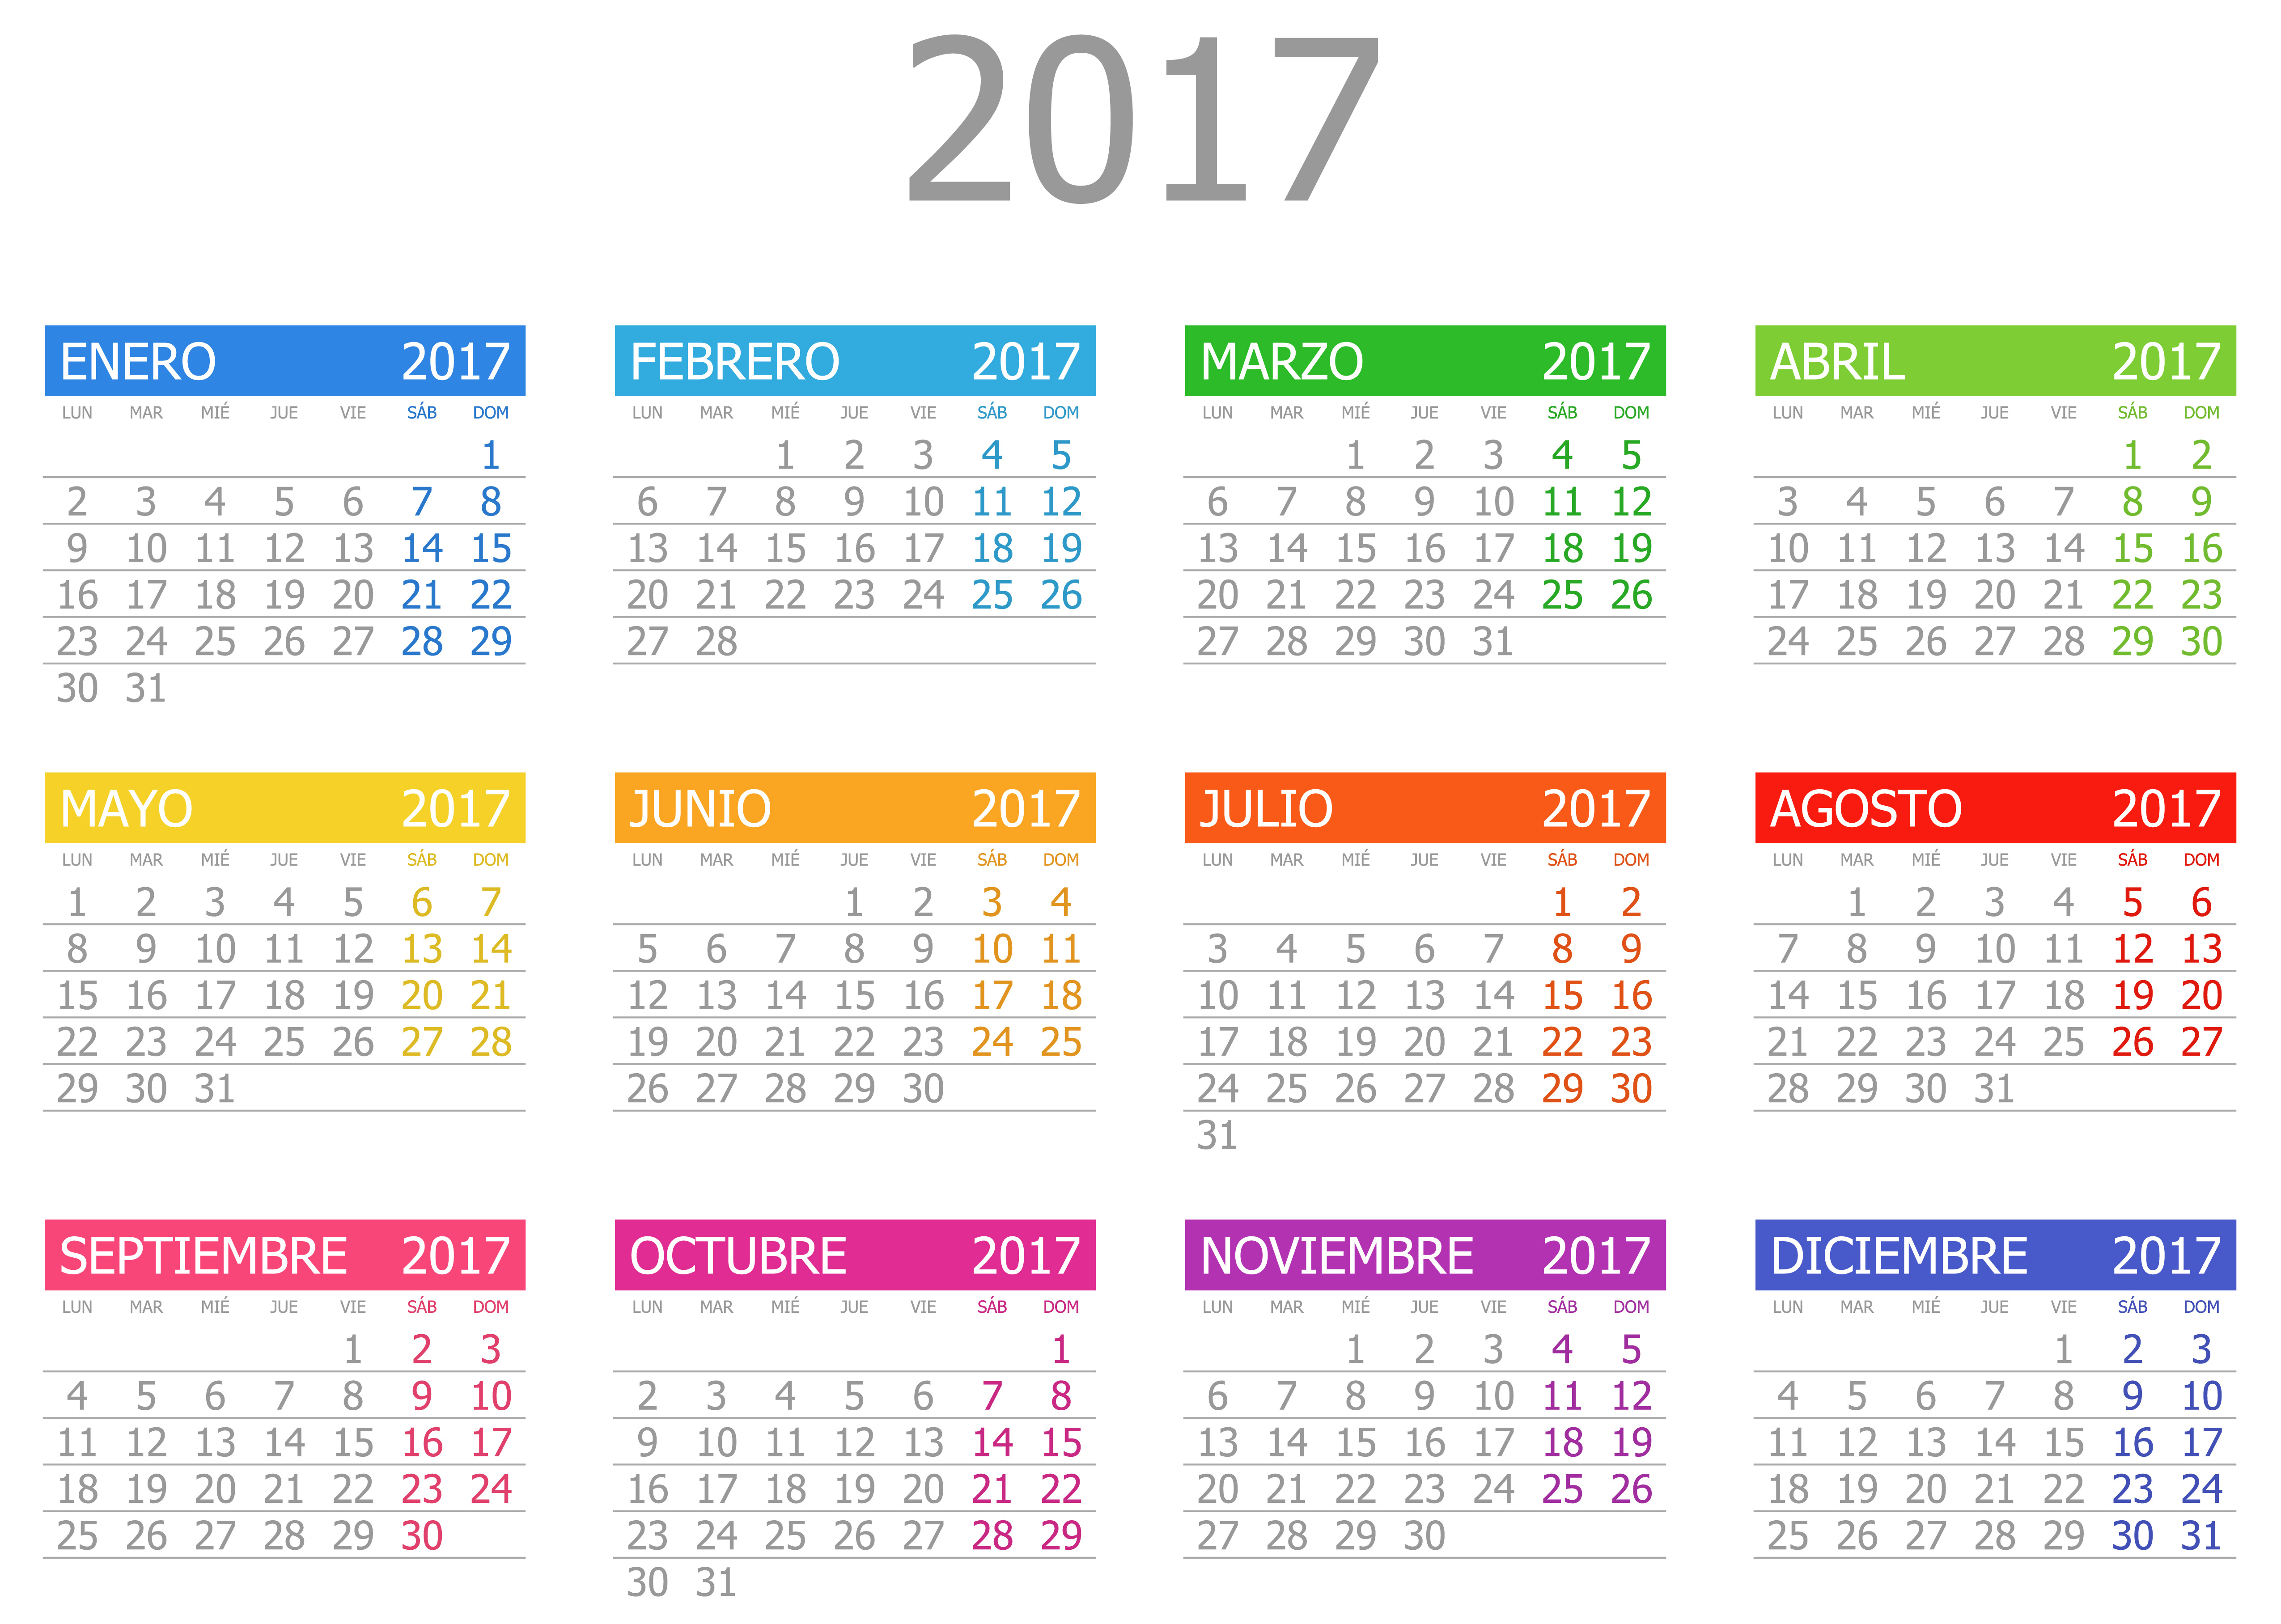 Calendario 2017 - Imagenes Educativas